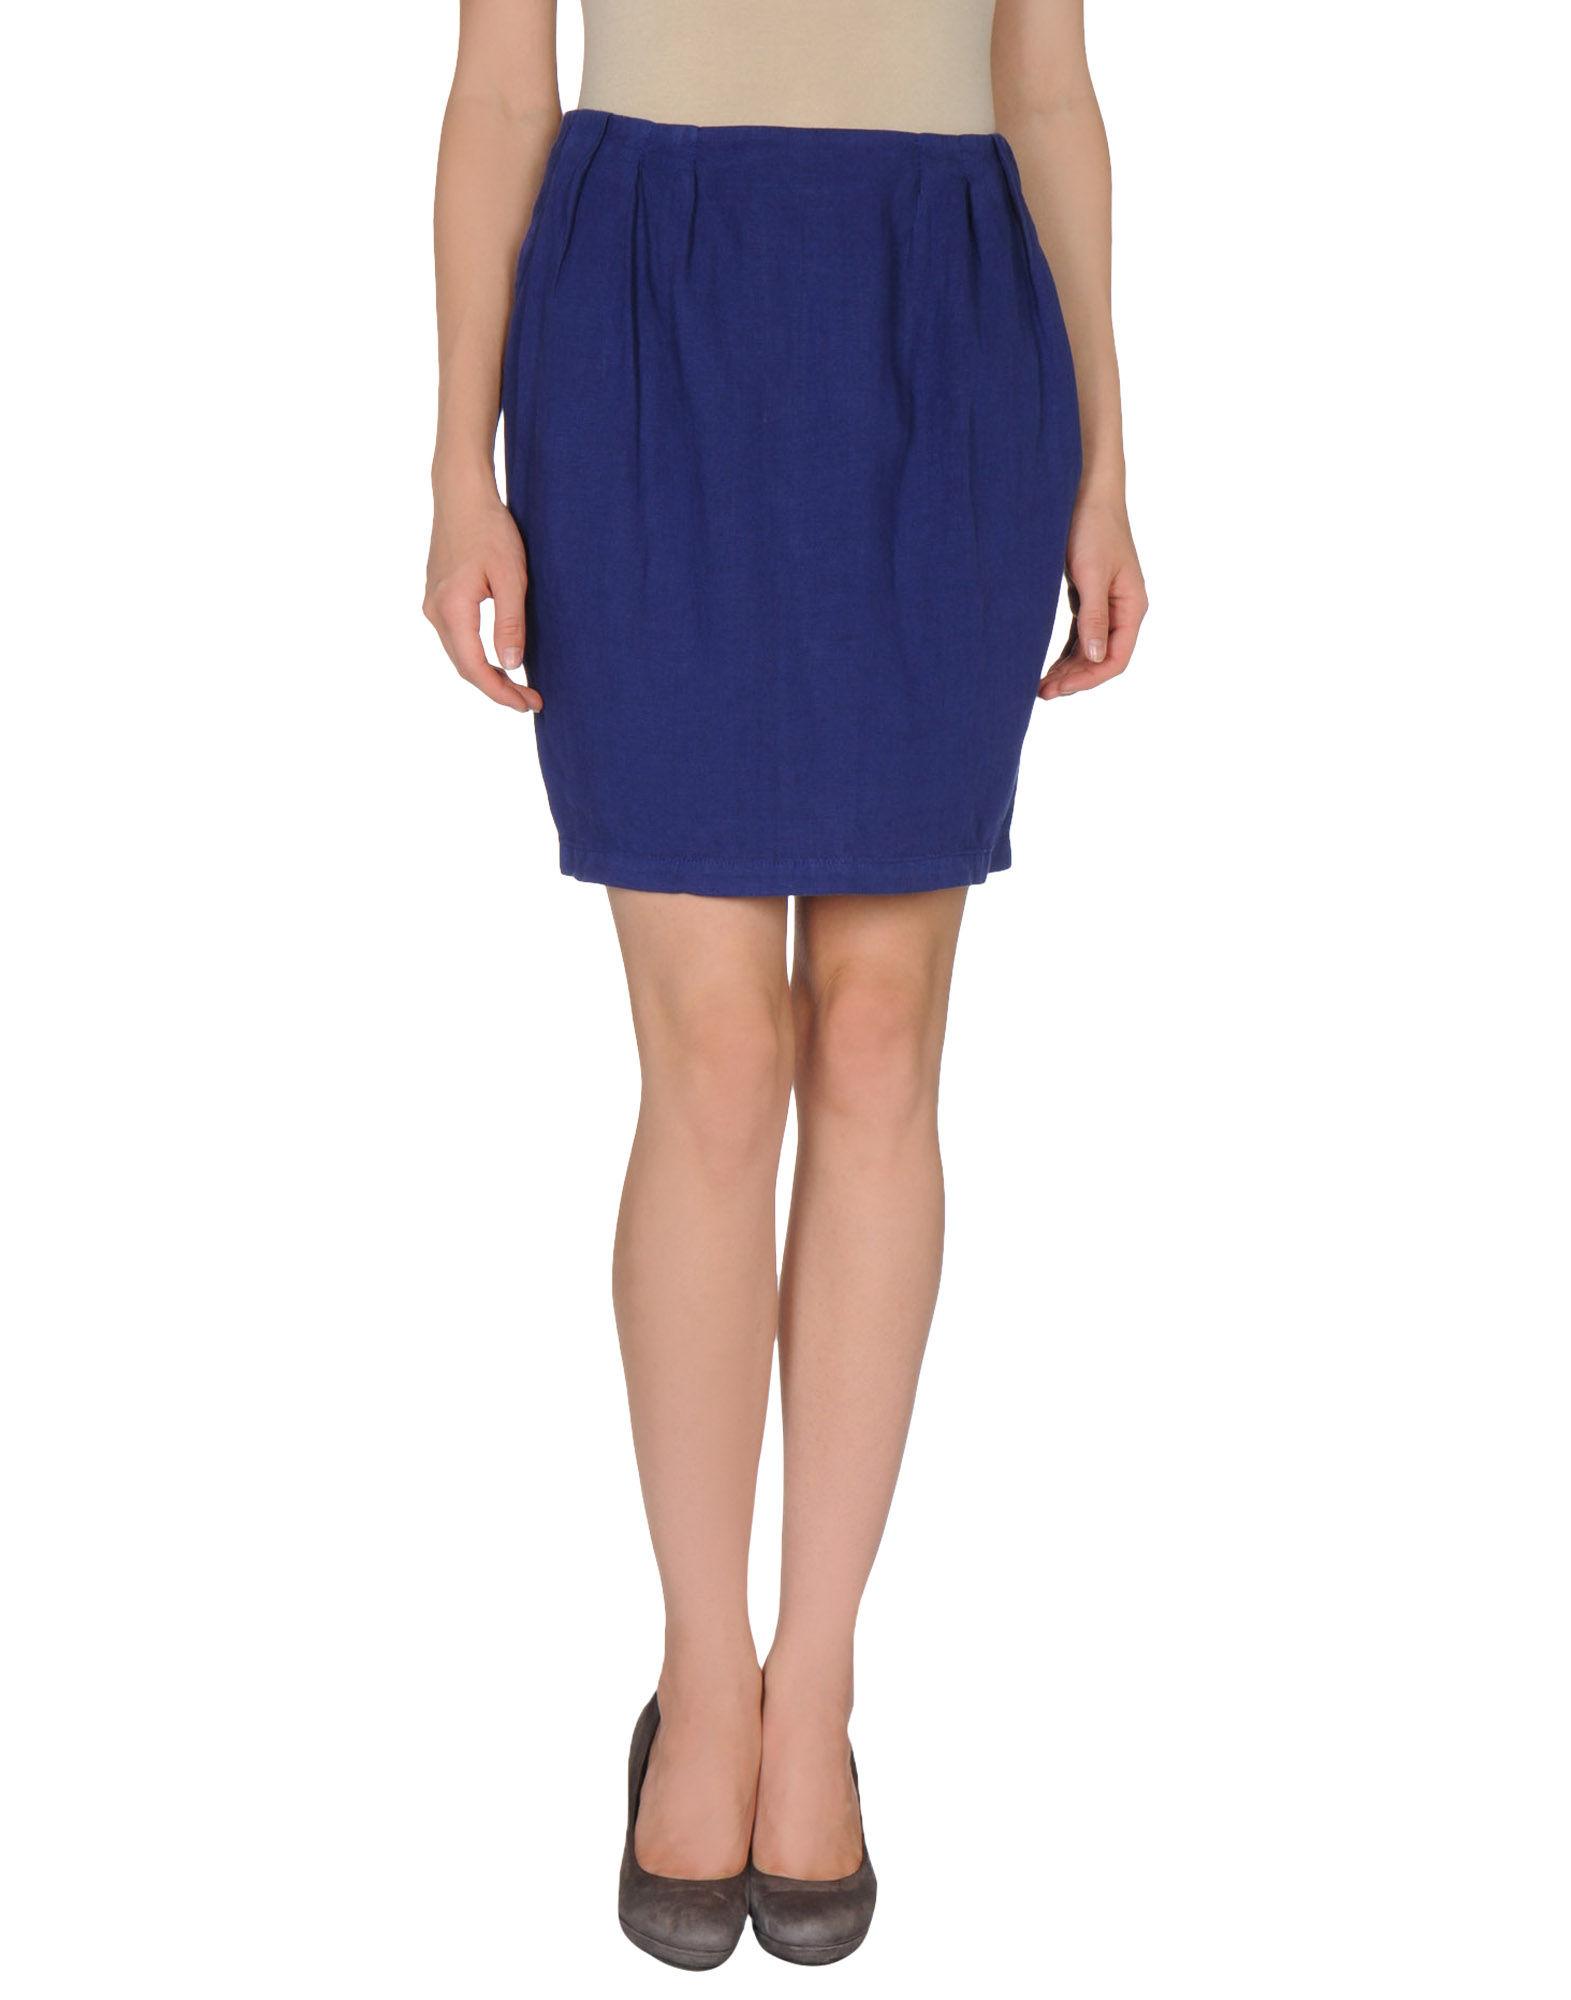 armani knee length skirt in purple violet lyst